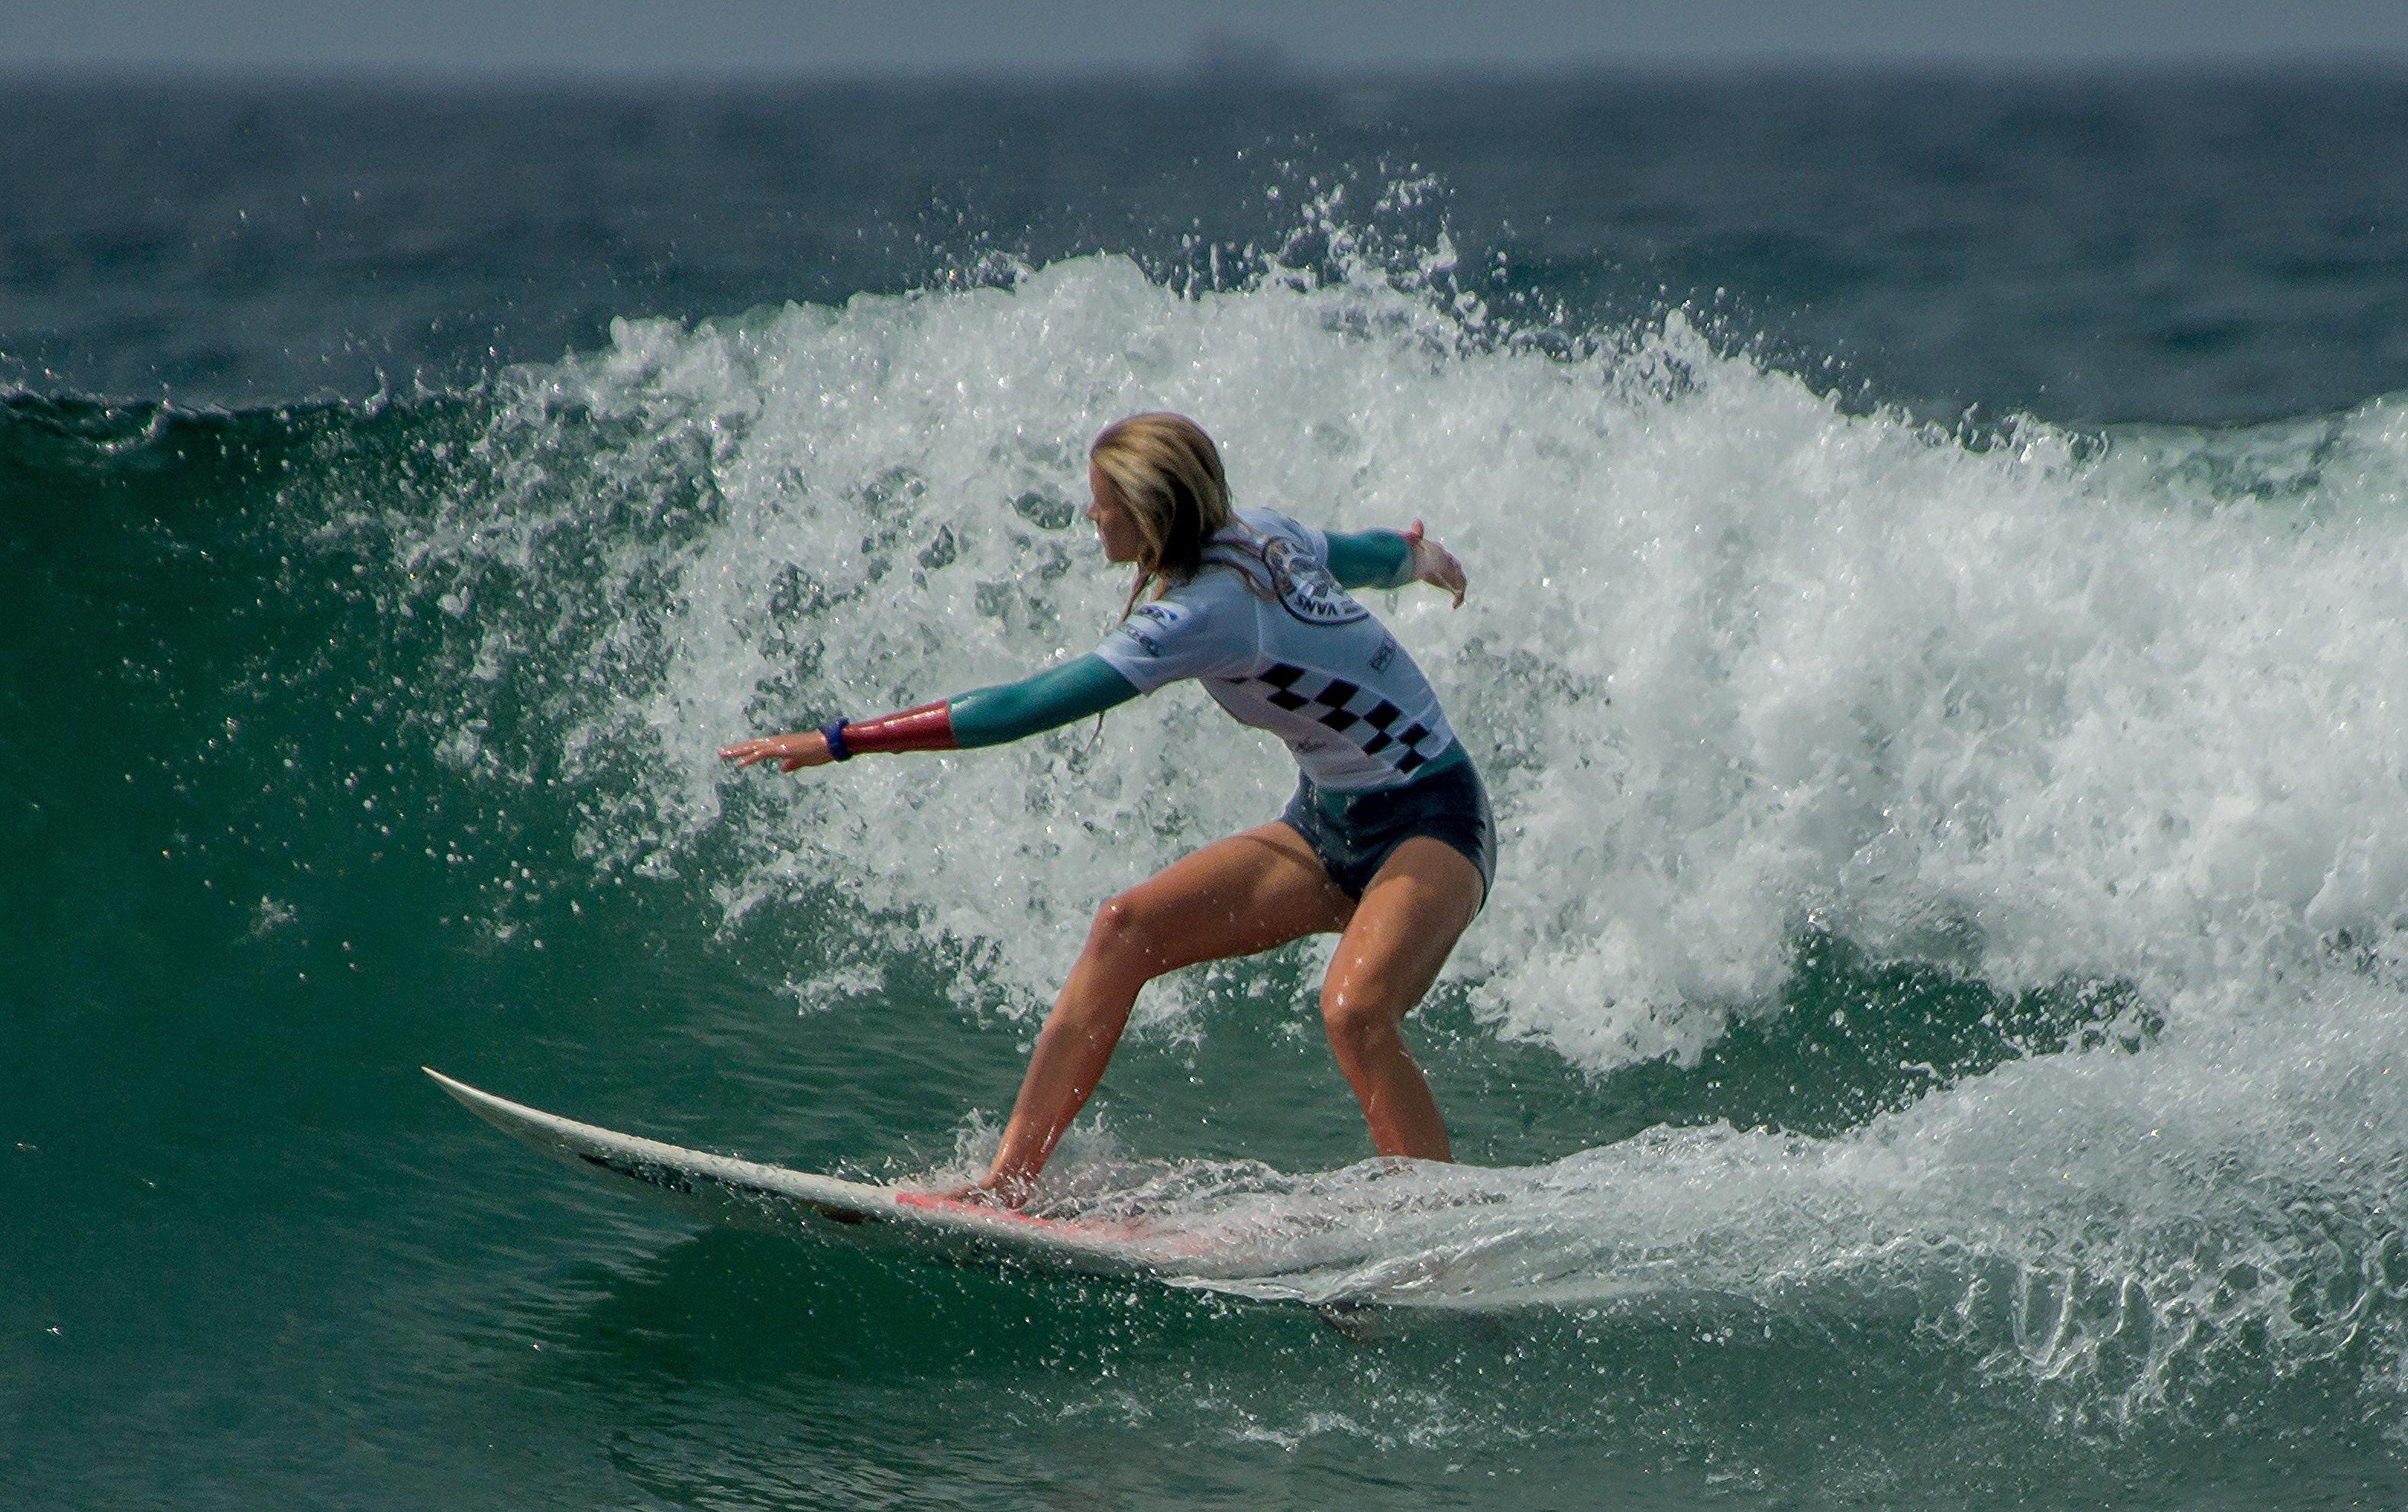 Rubias practicando Surf - 3153x1980